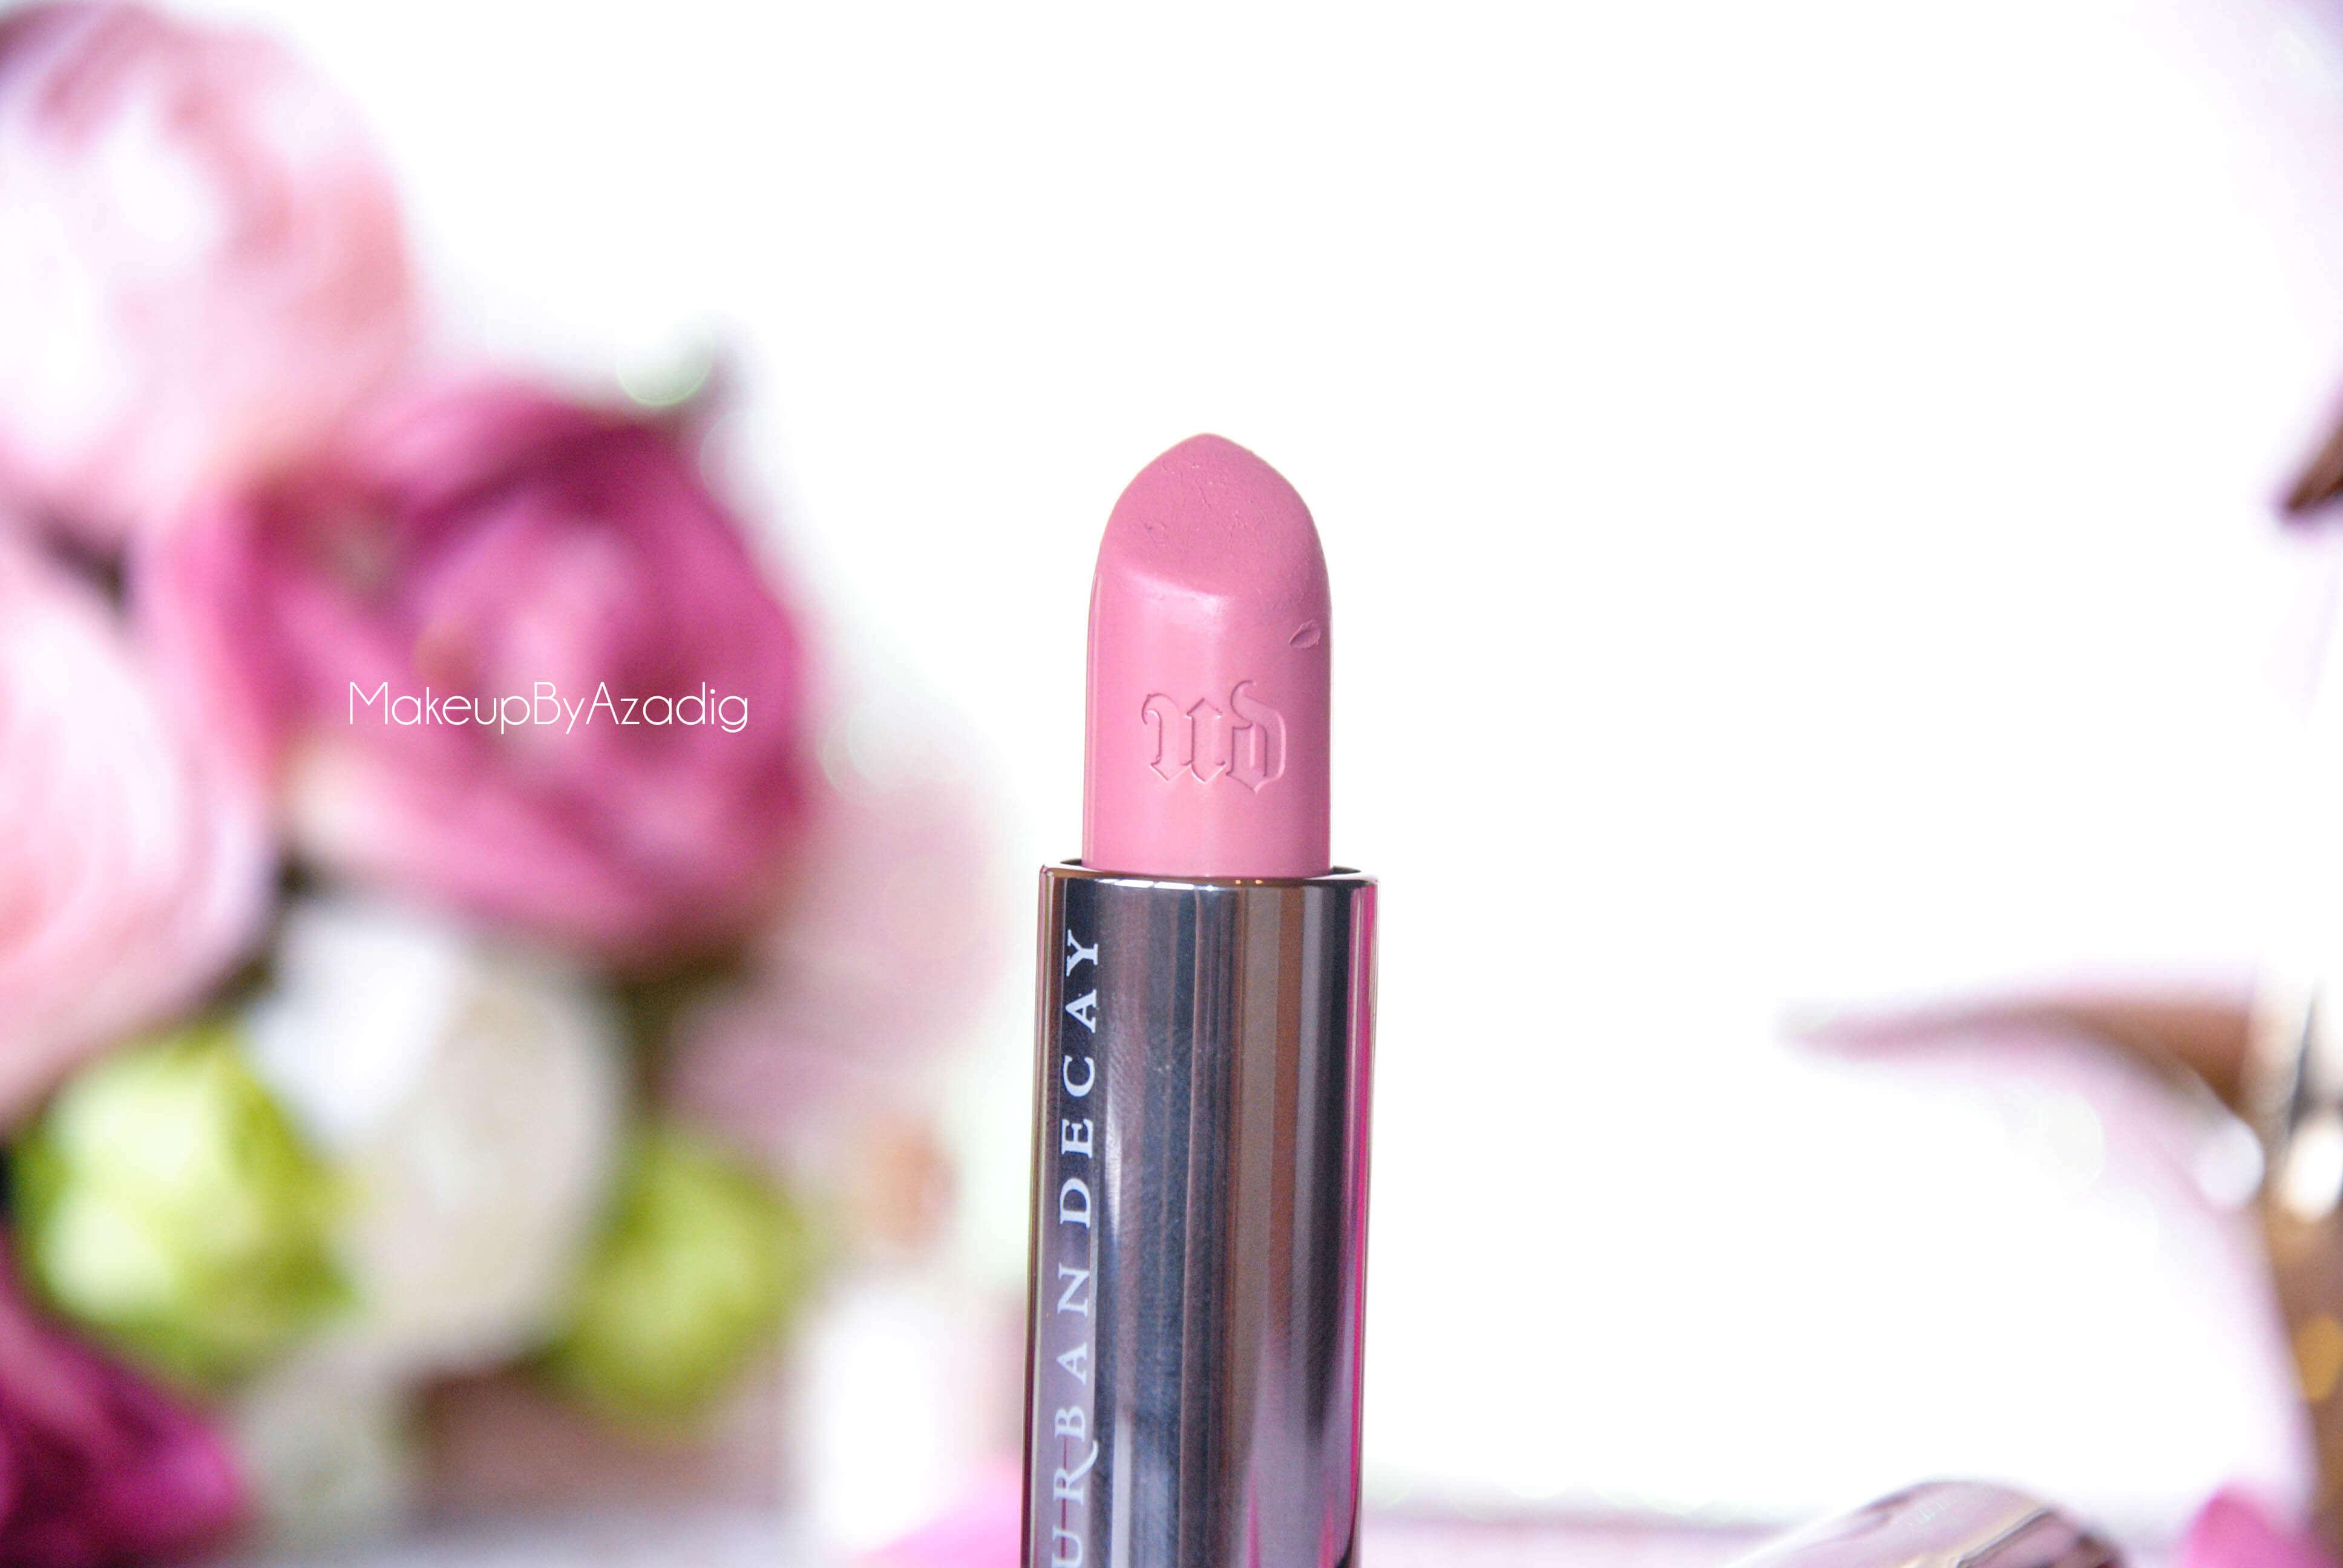 vice lipstick-urban decay-makeupbyazadig-backtalk-mauve-rouge a levres-avis-revue-swatch-review-raisin